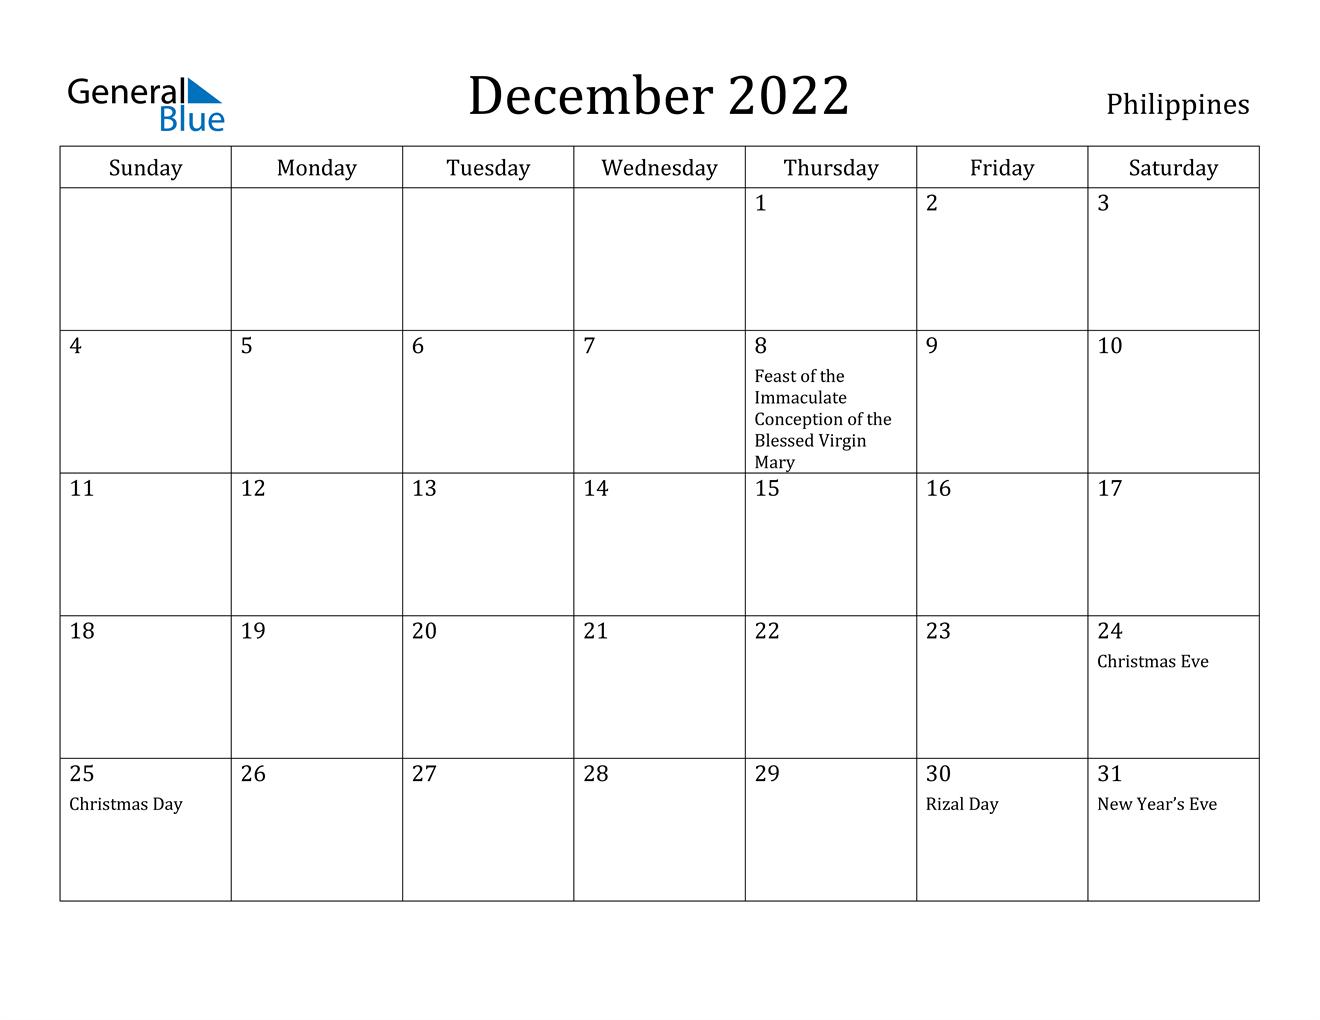 December 2022 Calendar - Philippines